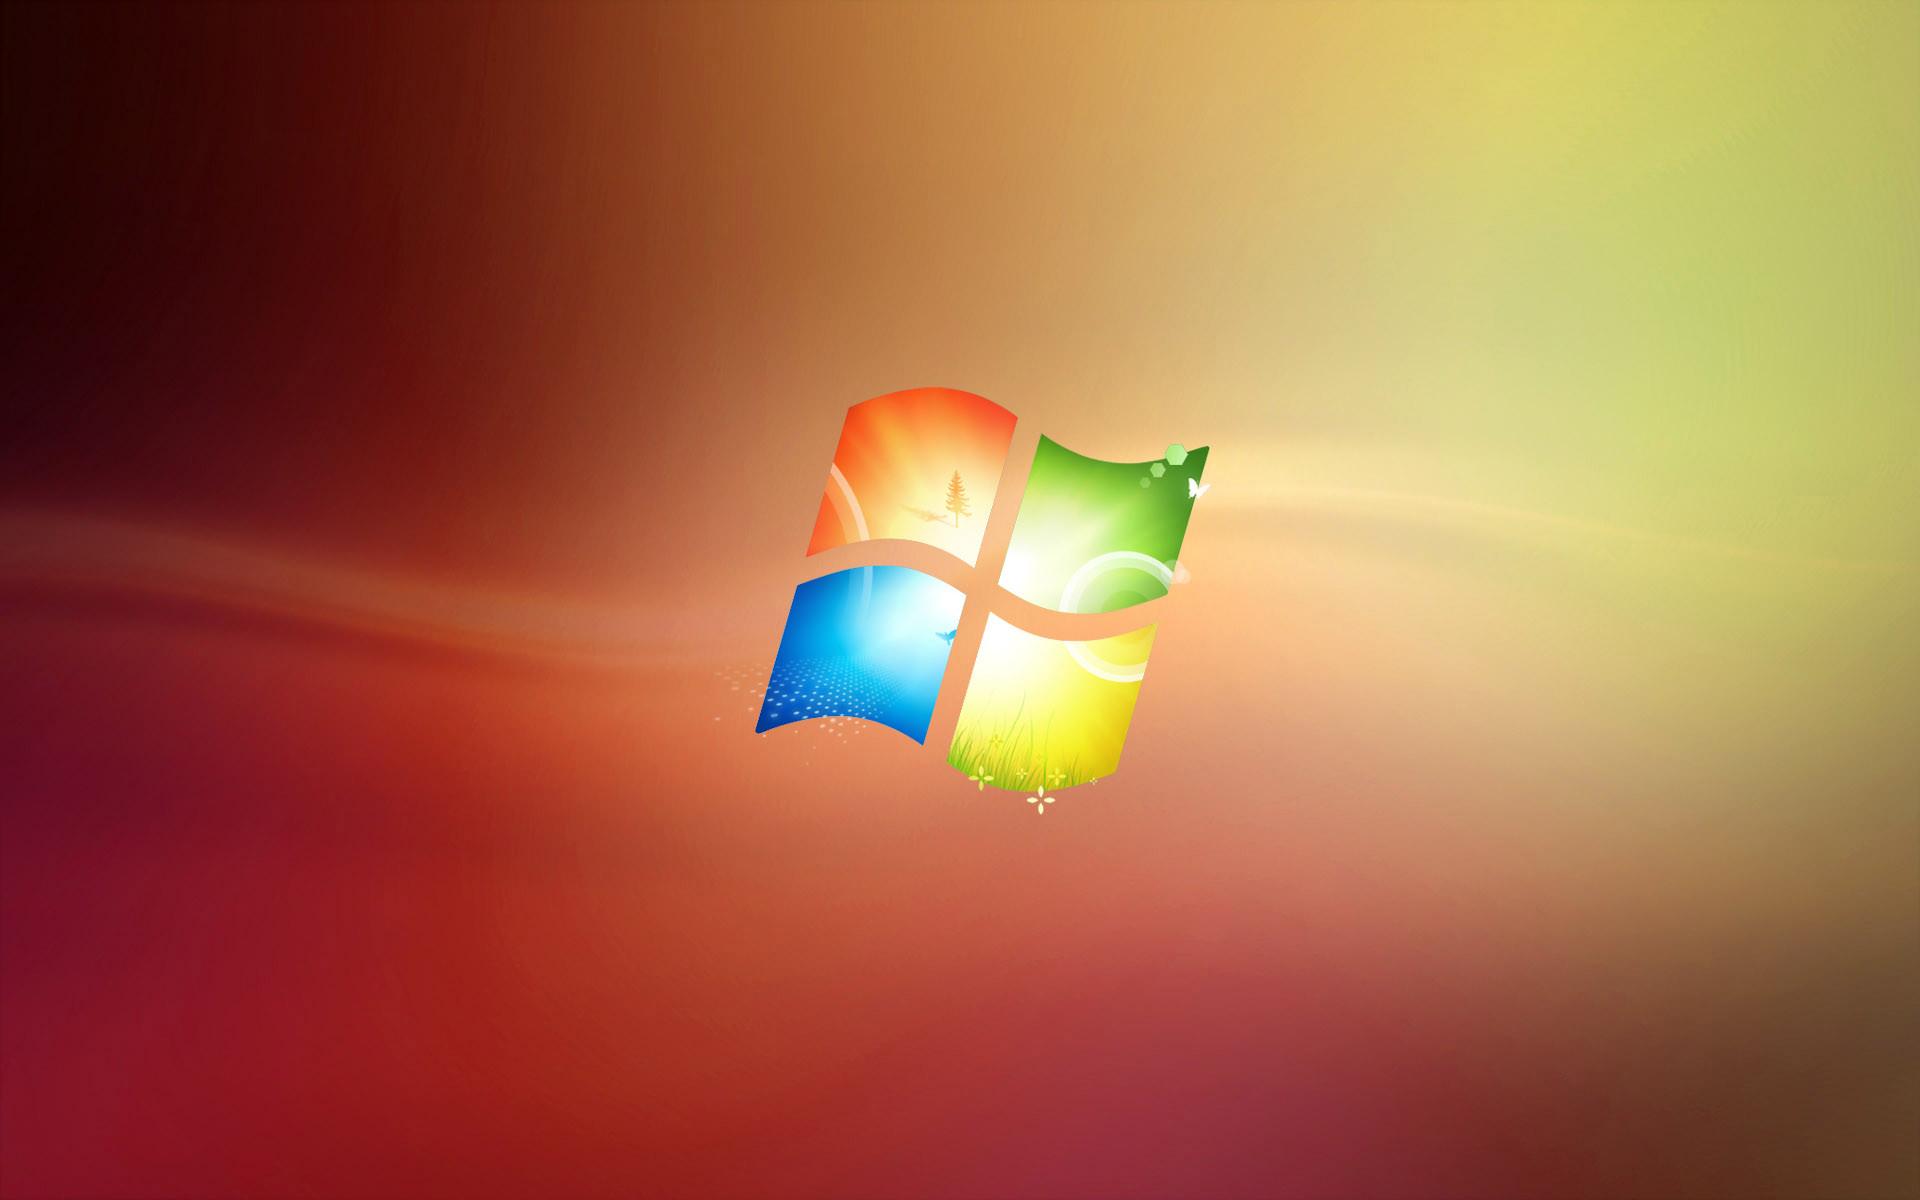 microsoft windows 7 desktop backgrounds (64+ images)